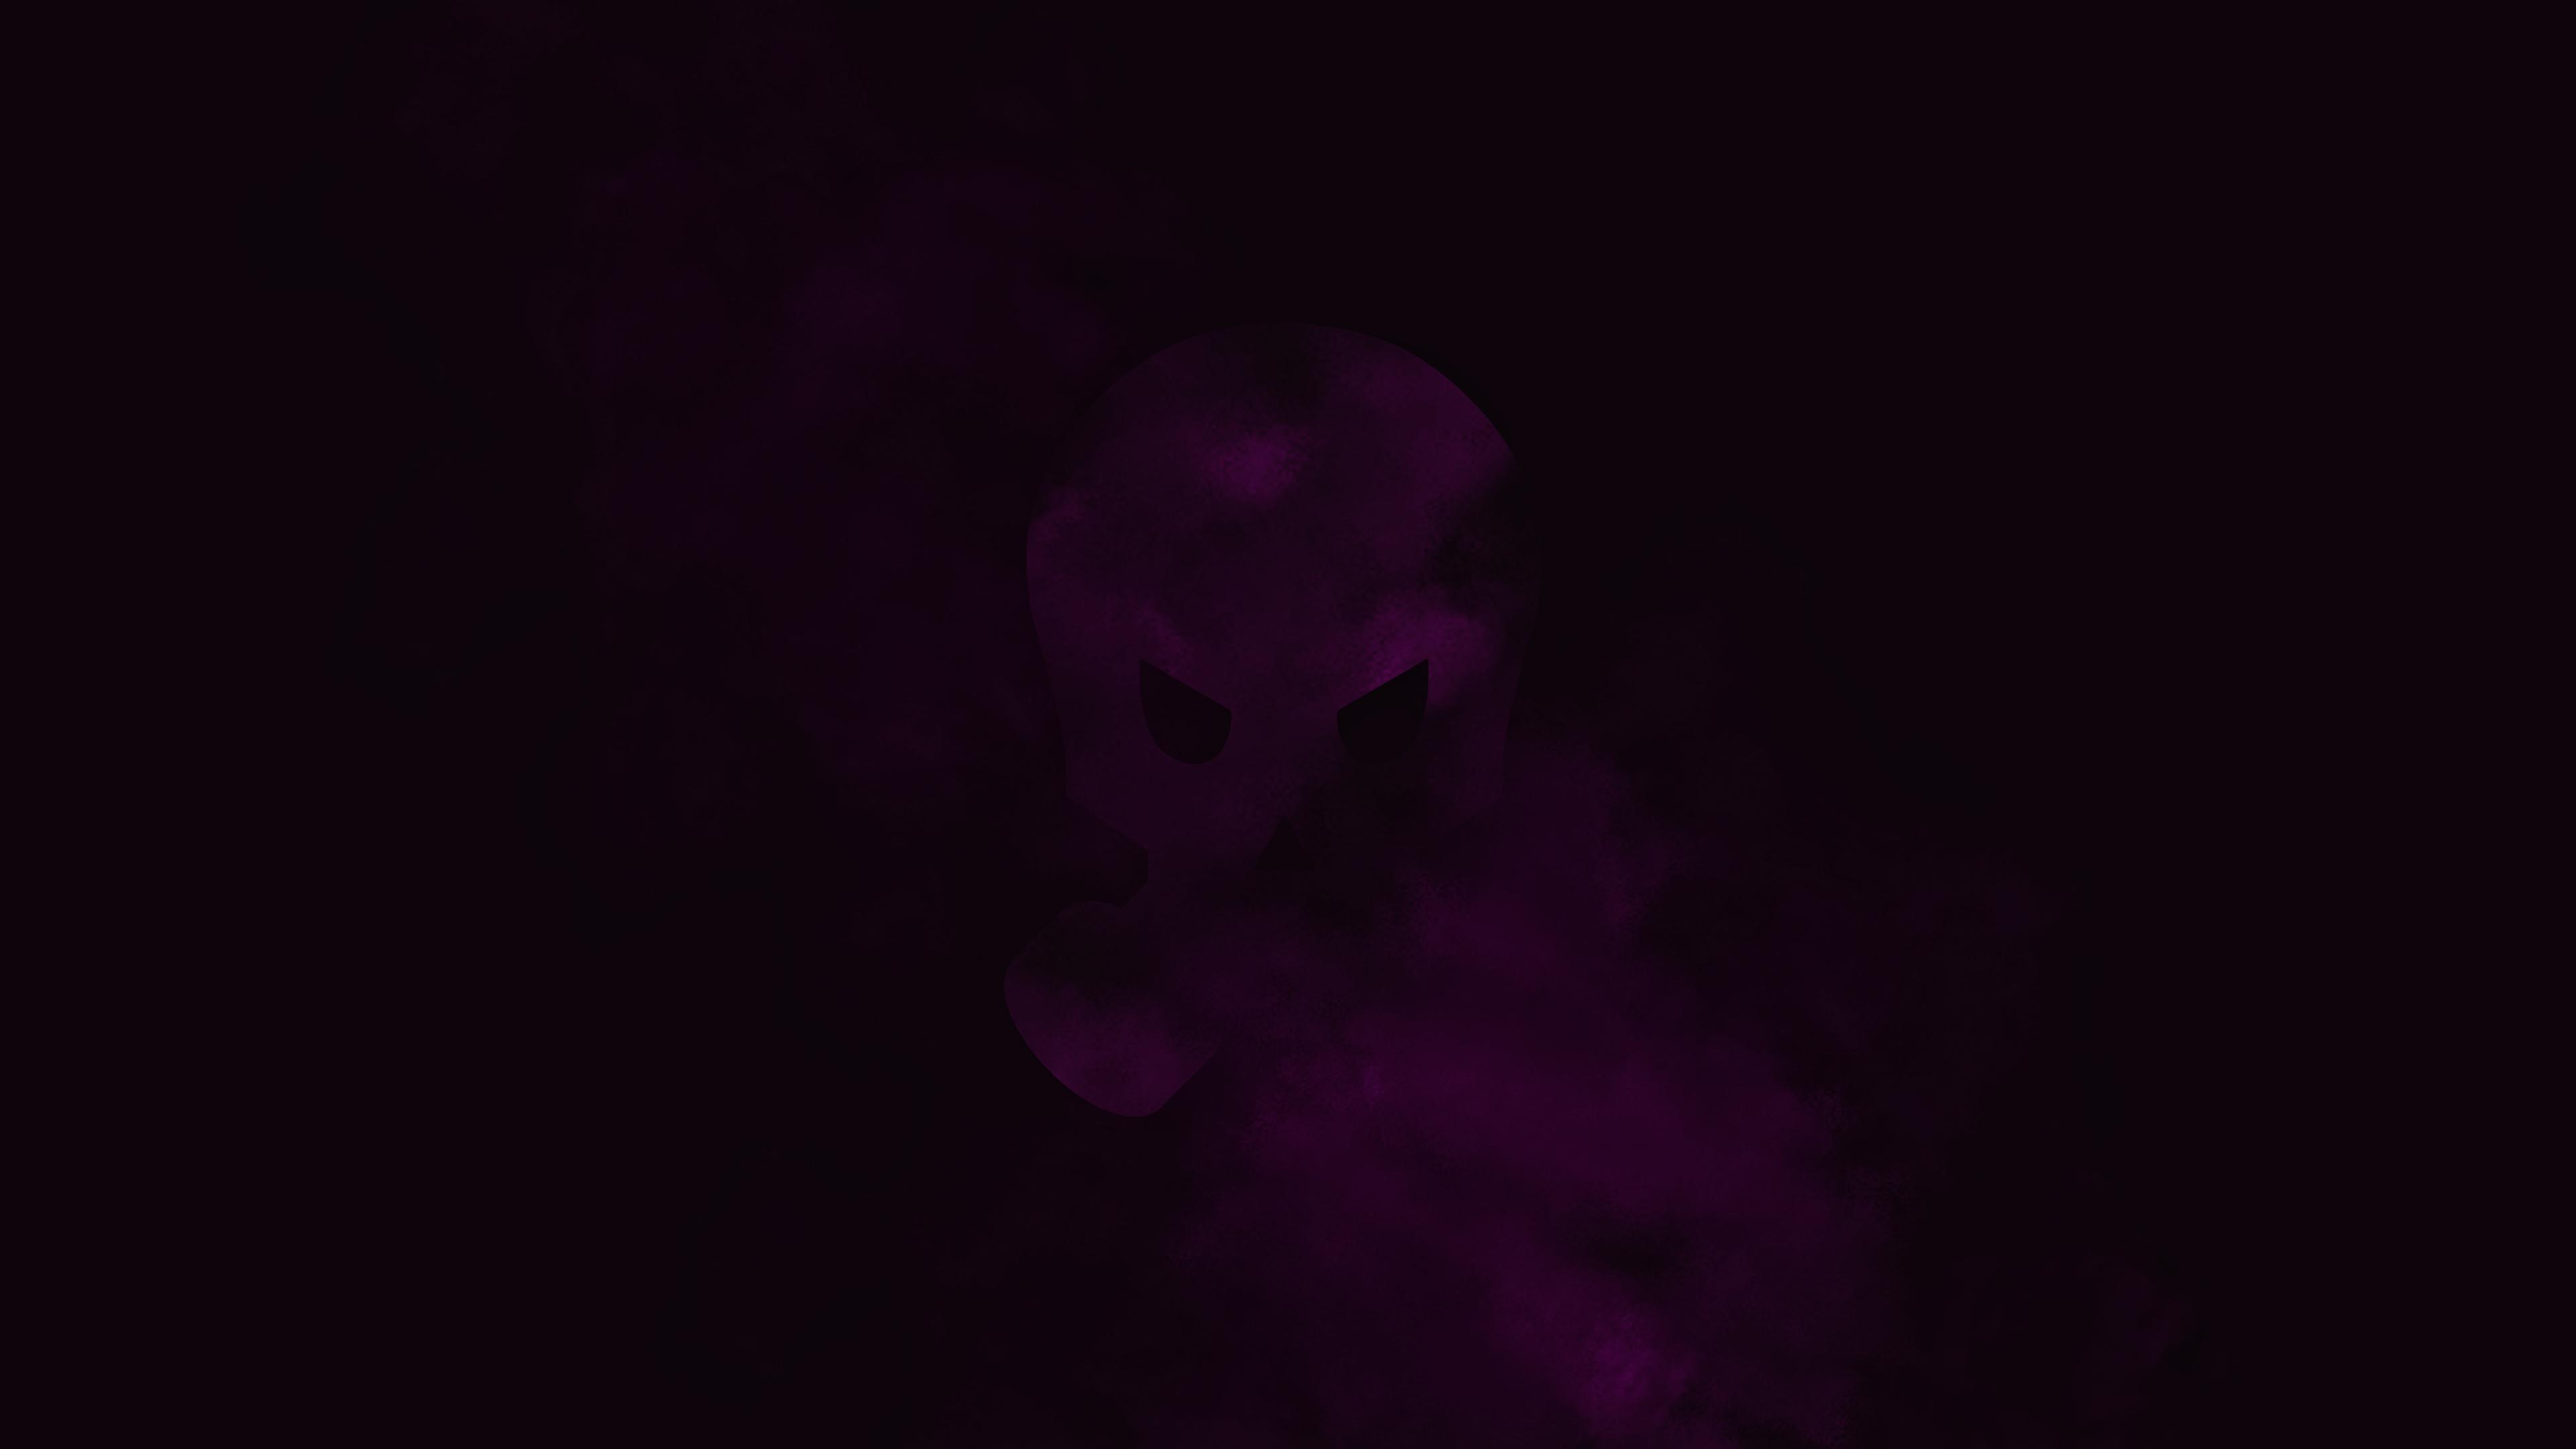 skull minimalism 12k 1540751709 - Skull Minimalism 12k - skull wallpapers, minimalism wallpapers, hd-wallpapers, digital art wallpapers, artwork wallpapers, artist wallpapers, 8k wallpapers, 5k wallpapers, 4k-wallpapers, 12k wallpapers, 10k wallpapers